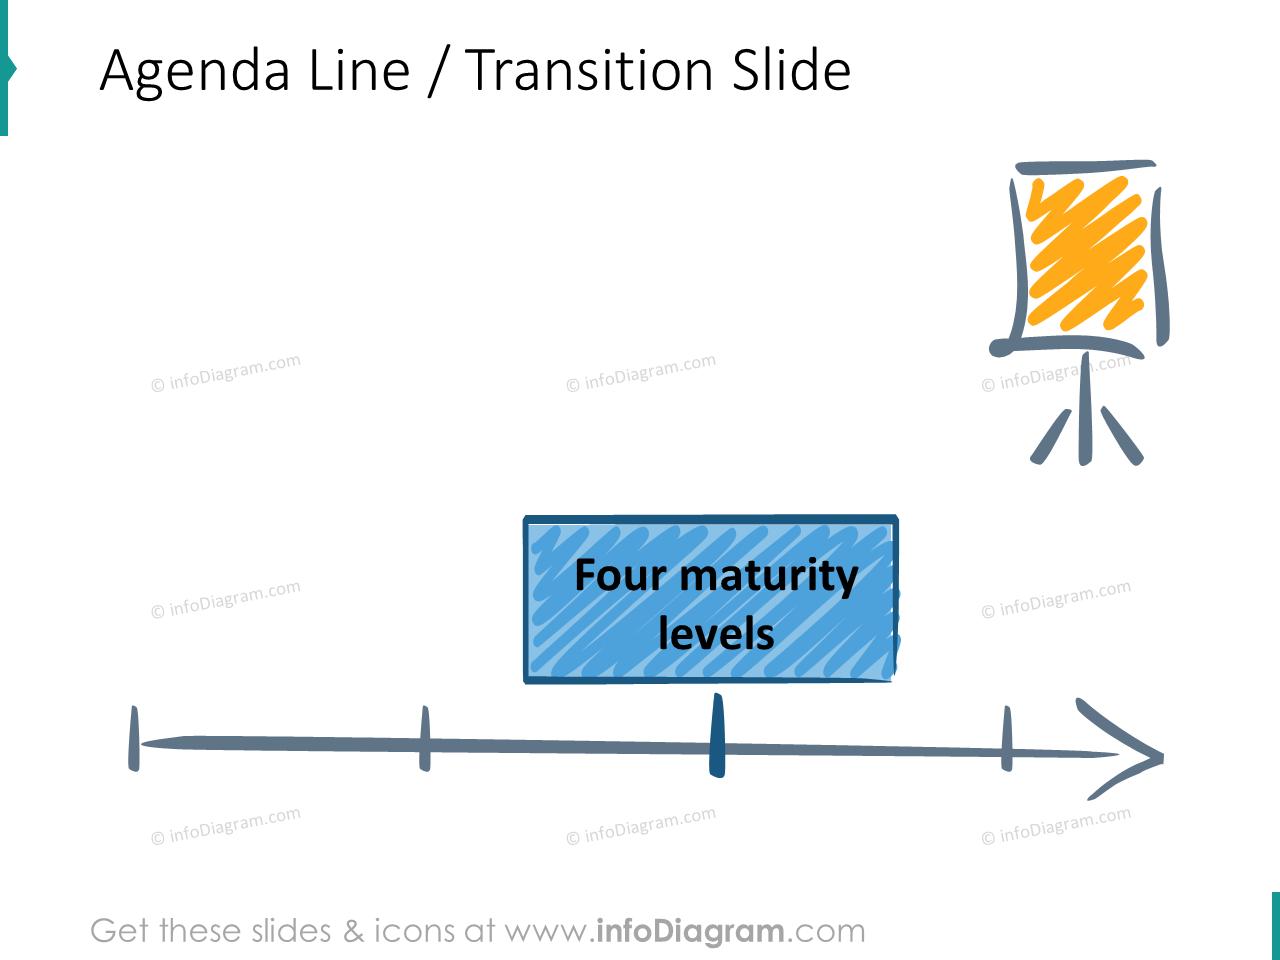 motivation training agenda transition slide 4maturity icons ppt clipart